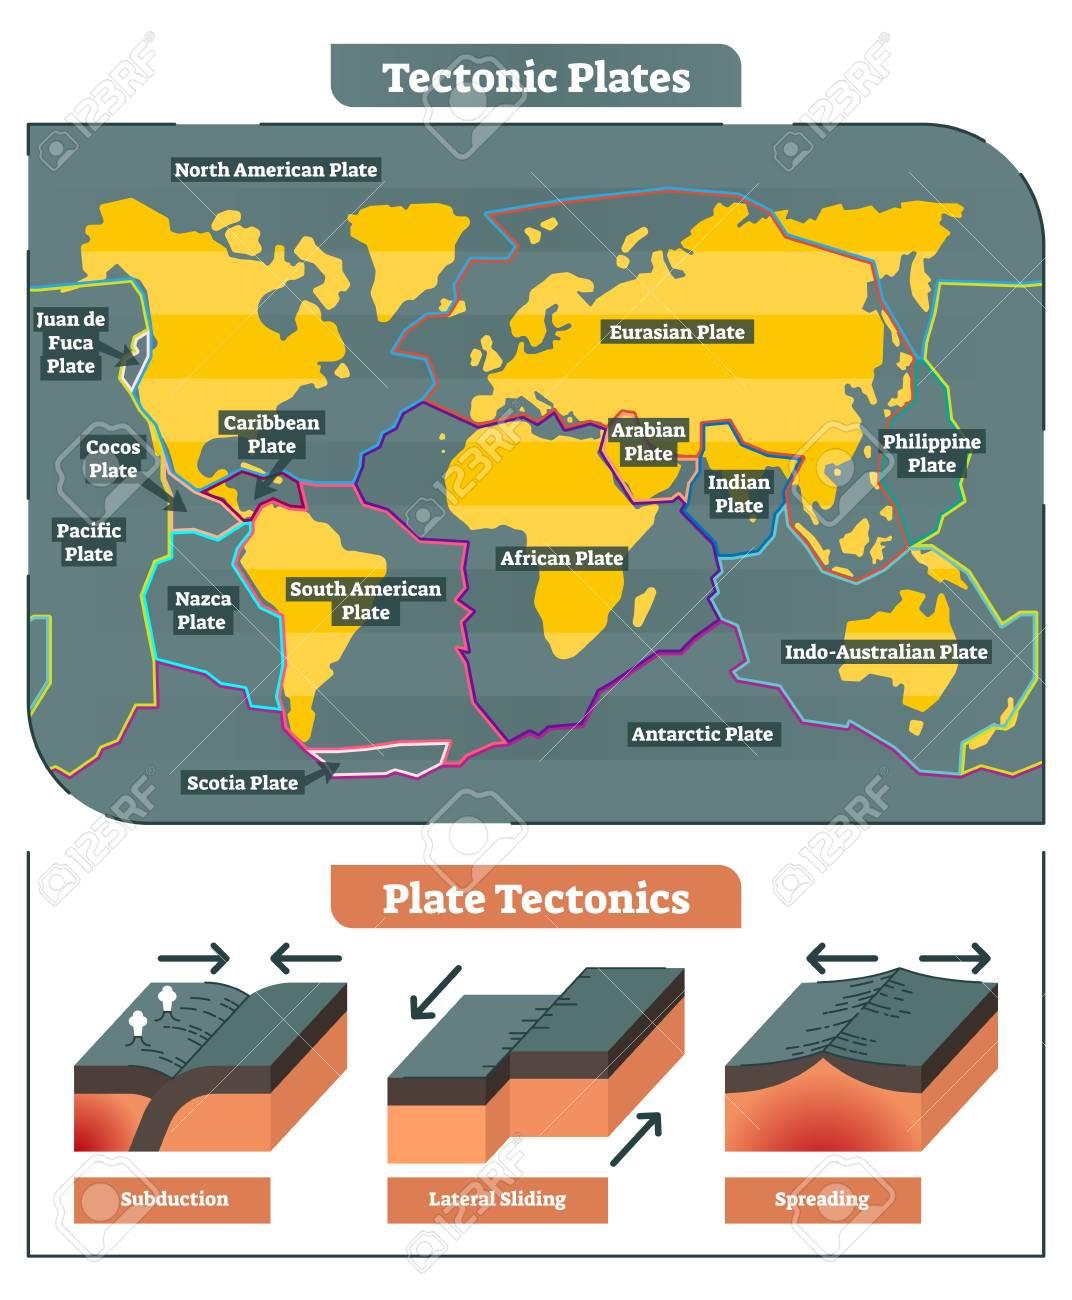 tectonic plates world map collection, diagram and tectonic movement Arabian Tectonic Plate